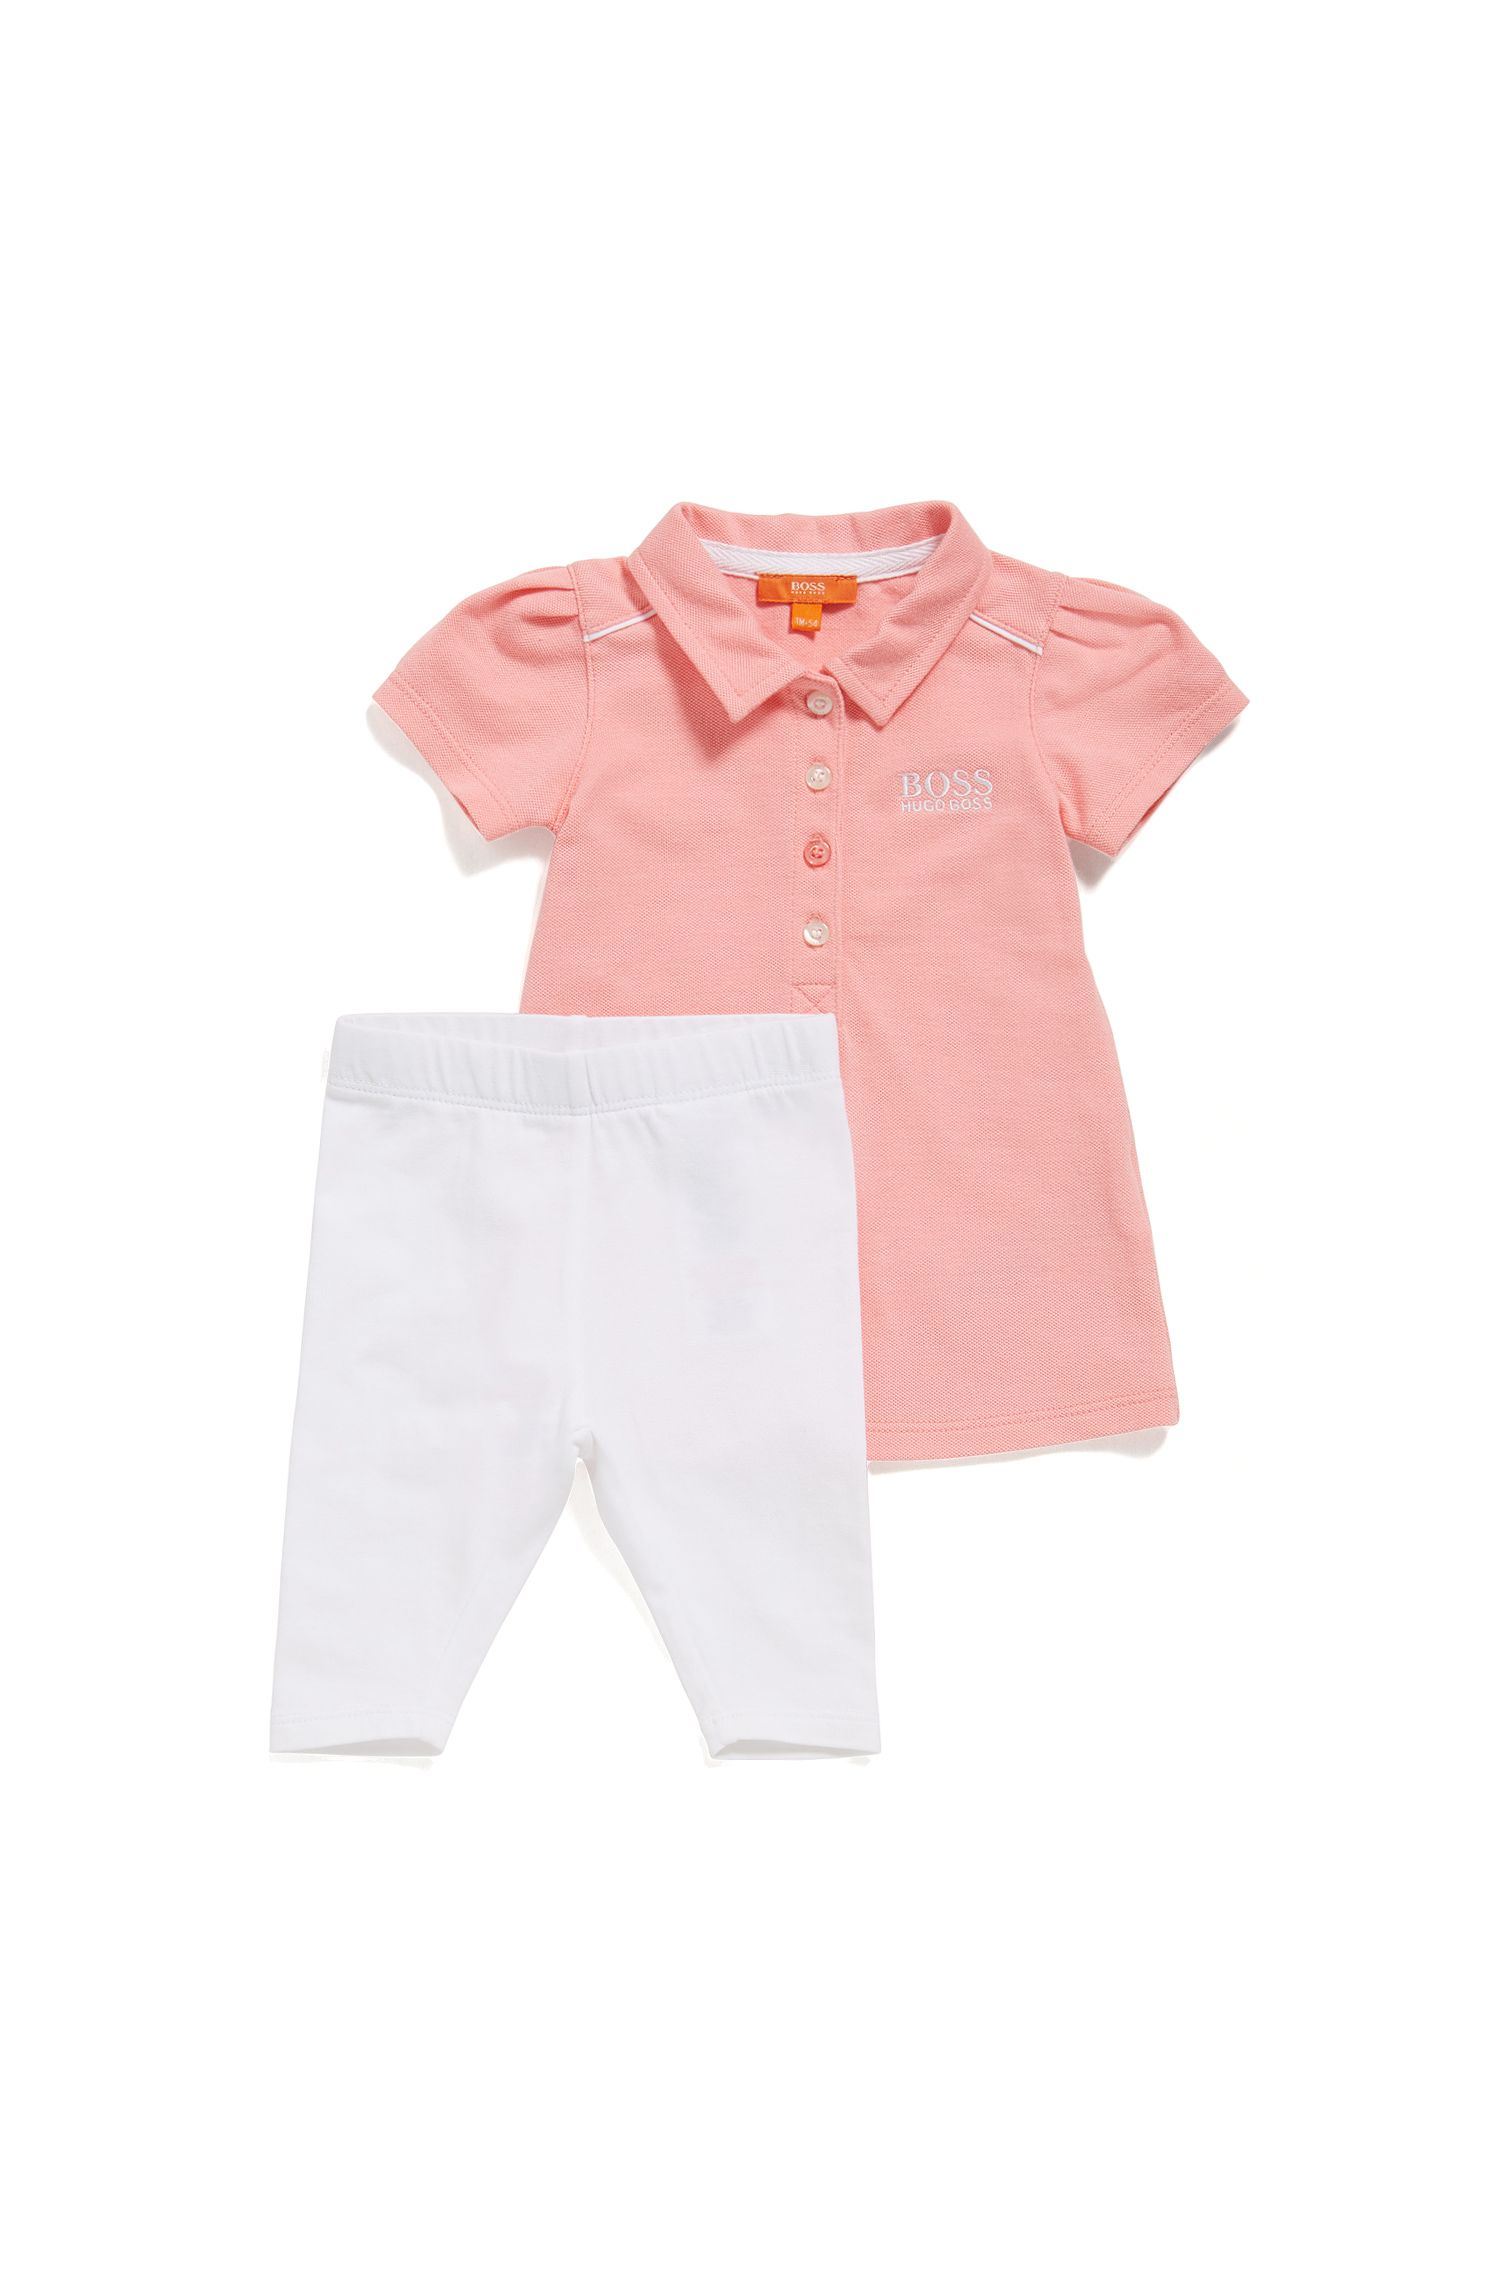 Babypoloshirt en legging van stretchkatoen: 'J98179'